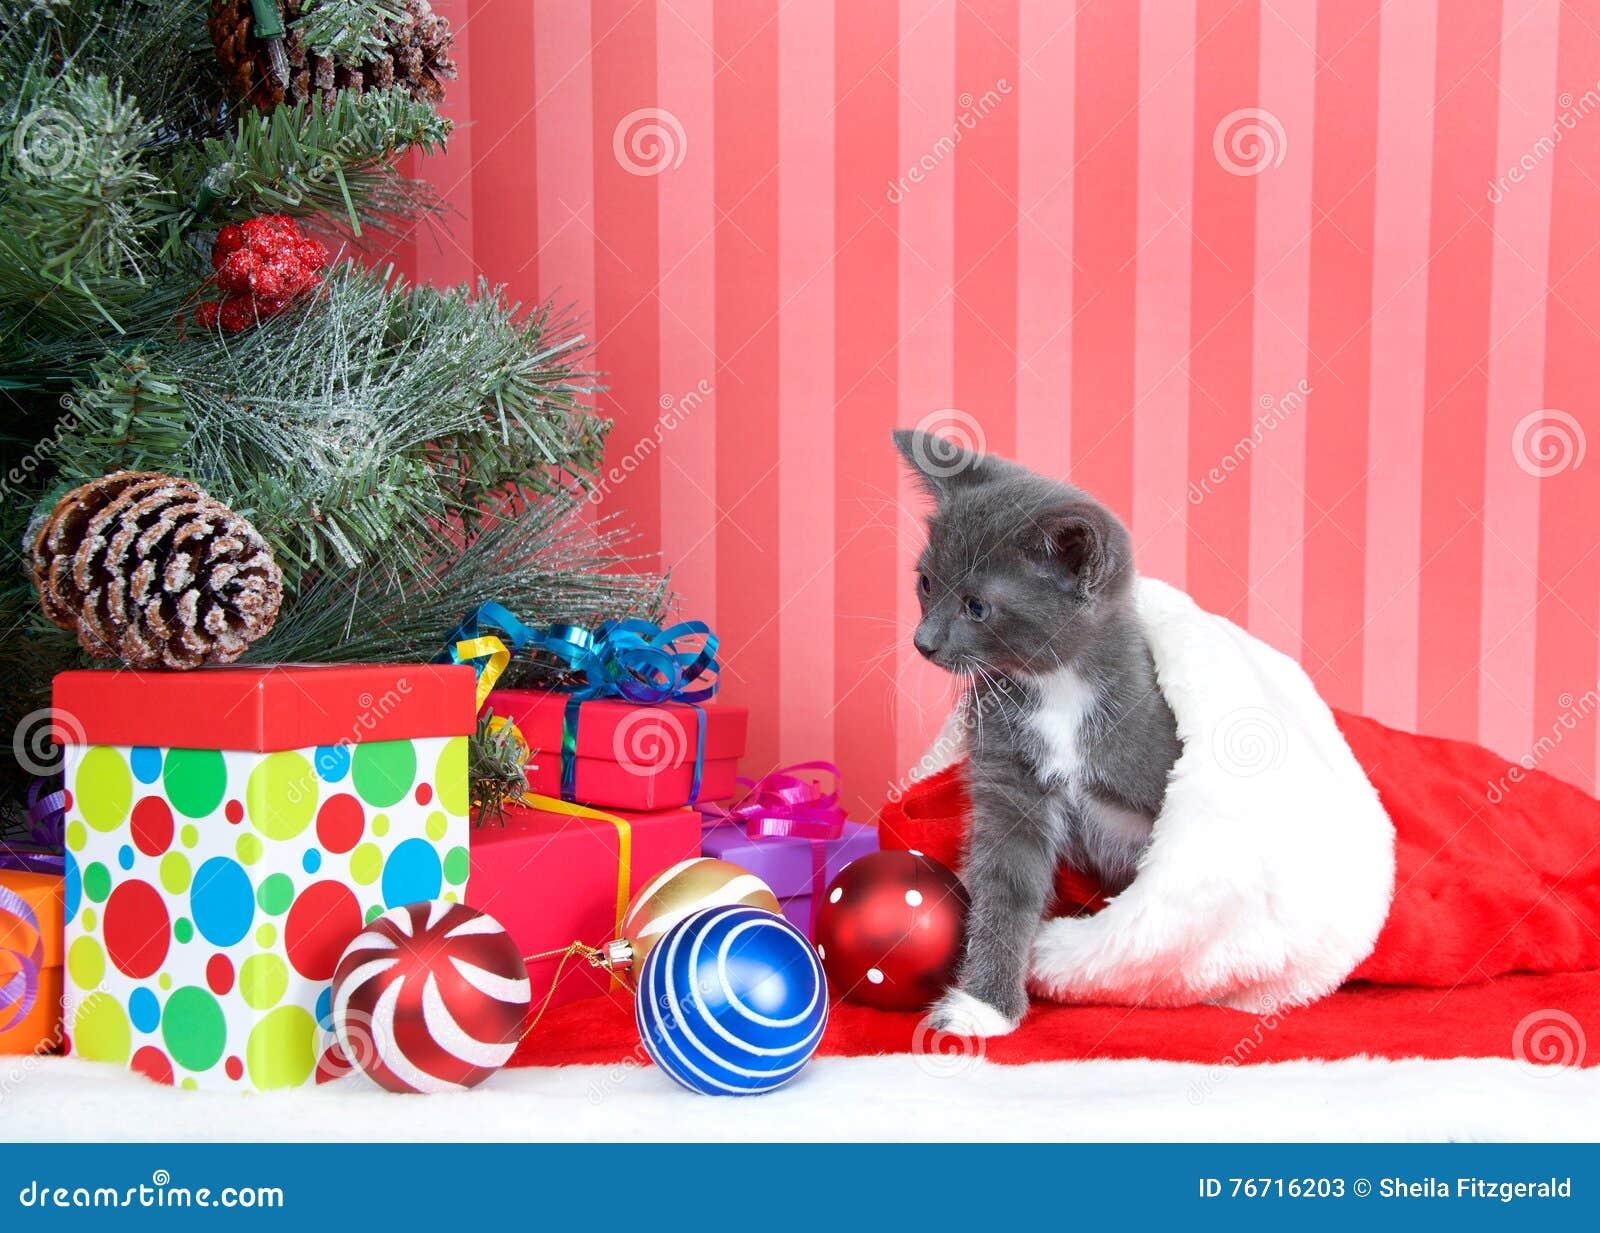 cb5ebaeeaa2 Gray Tabby Crawling Out Of Christmas Stocking Stock Image - Image of ...